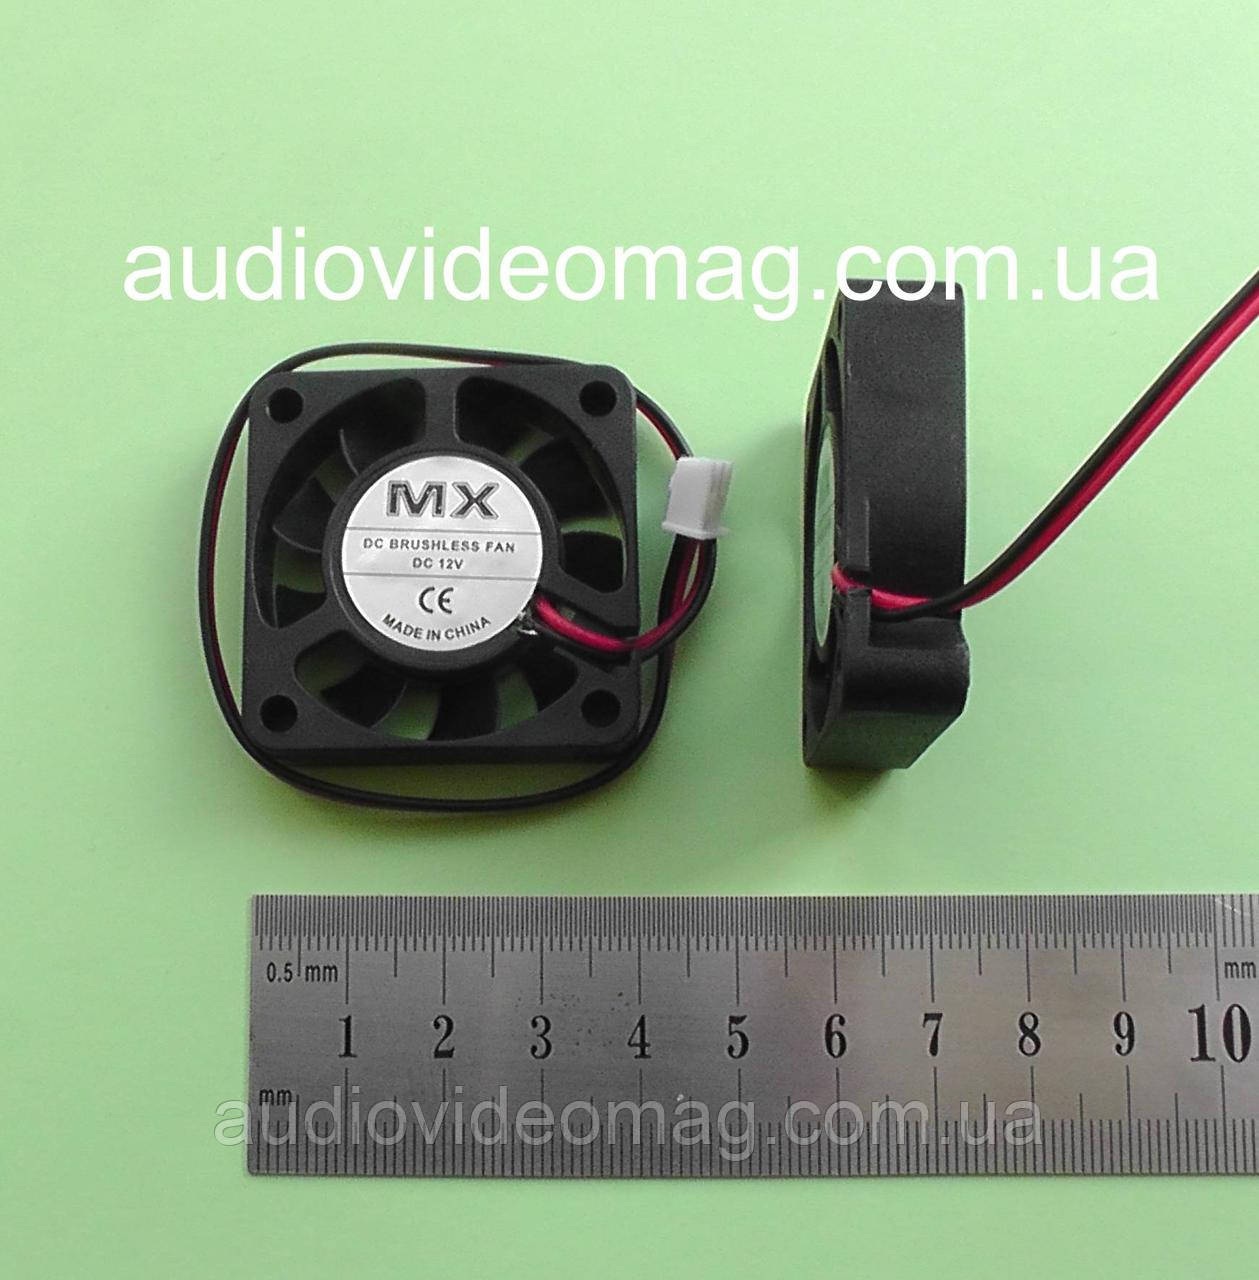 Вентилятор (кулер) 12V, 40х40х10 мм, 2 pin,  компьютерный, для видеокарт